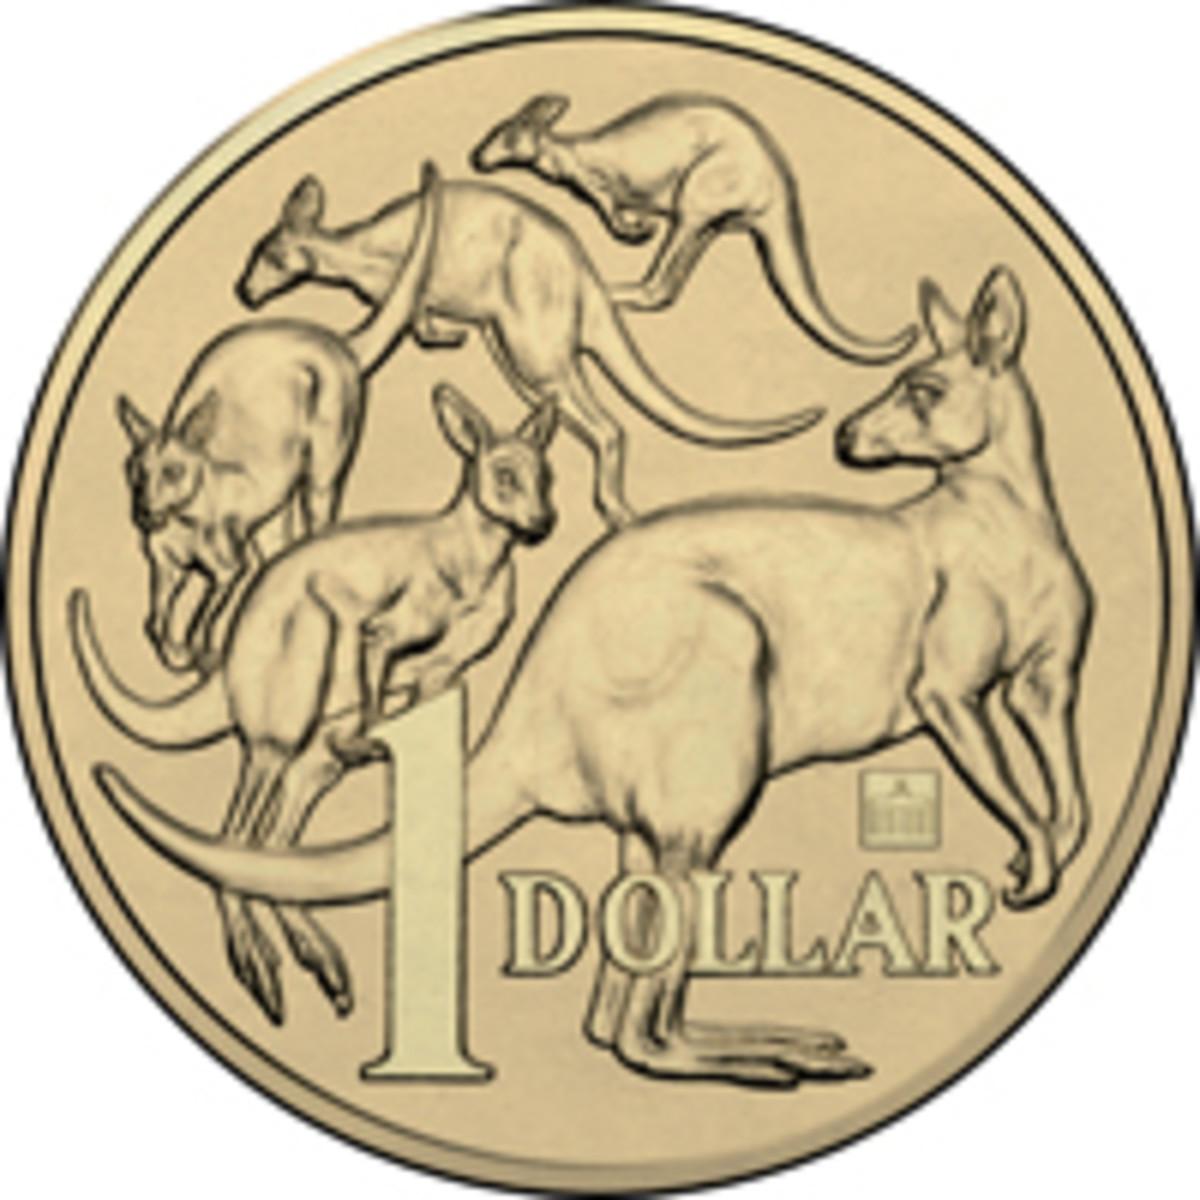 Australian aluminum-bronze dollars privy-marked with the Brandenburg Gate. (Image courtesy Downies)